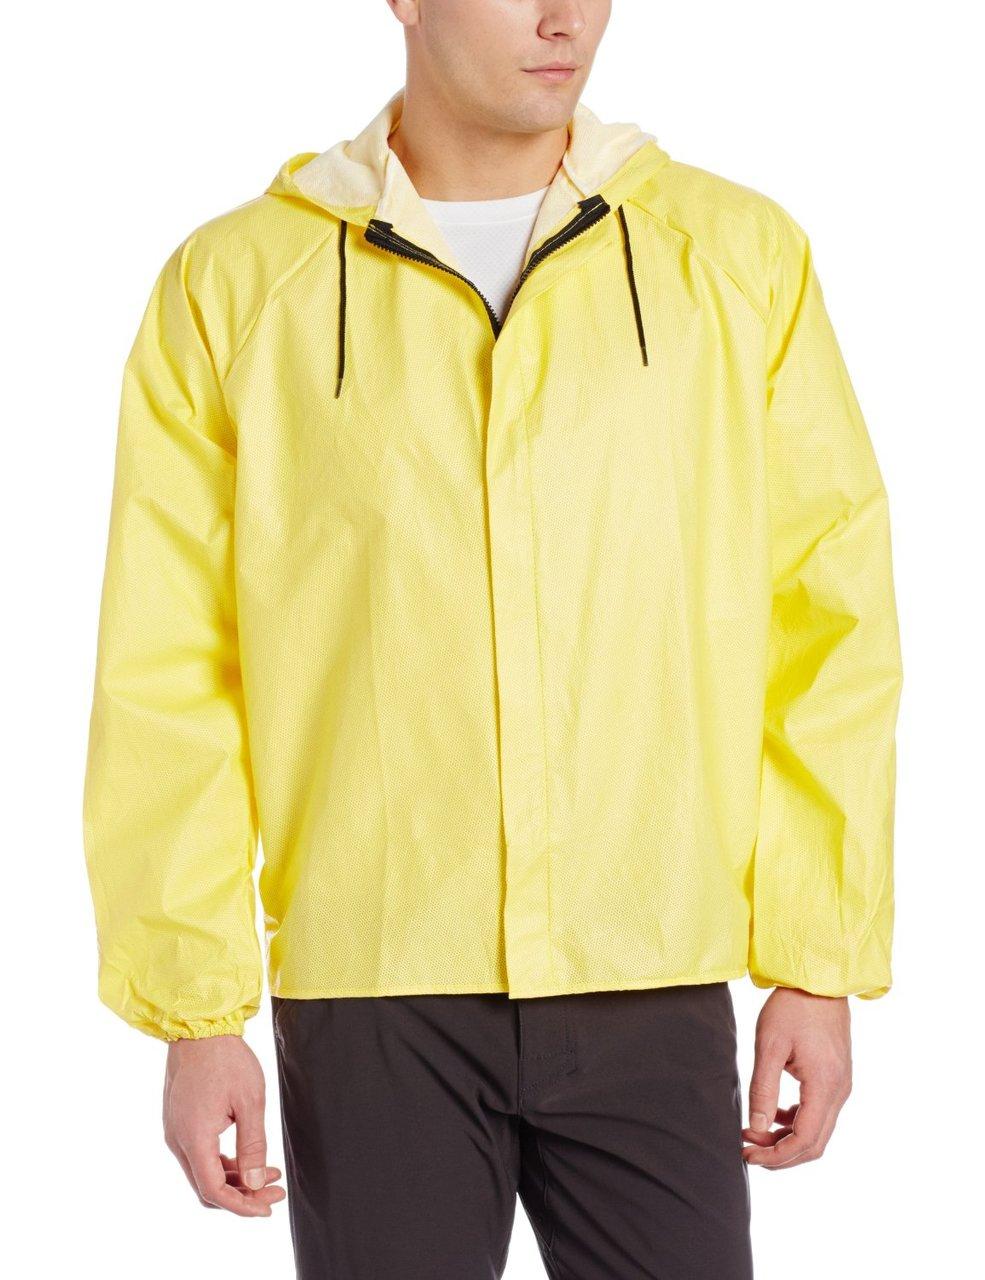 O2 Unisex Rainshield Hooded  Rain Jacket - Waterproof, Breathable, Windproof Questions & Answers